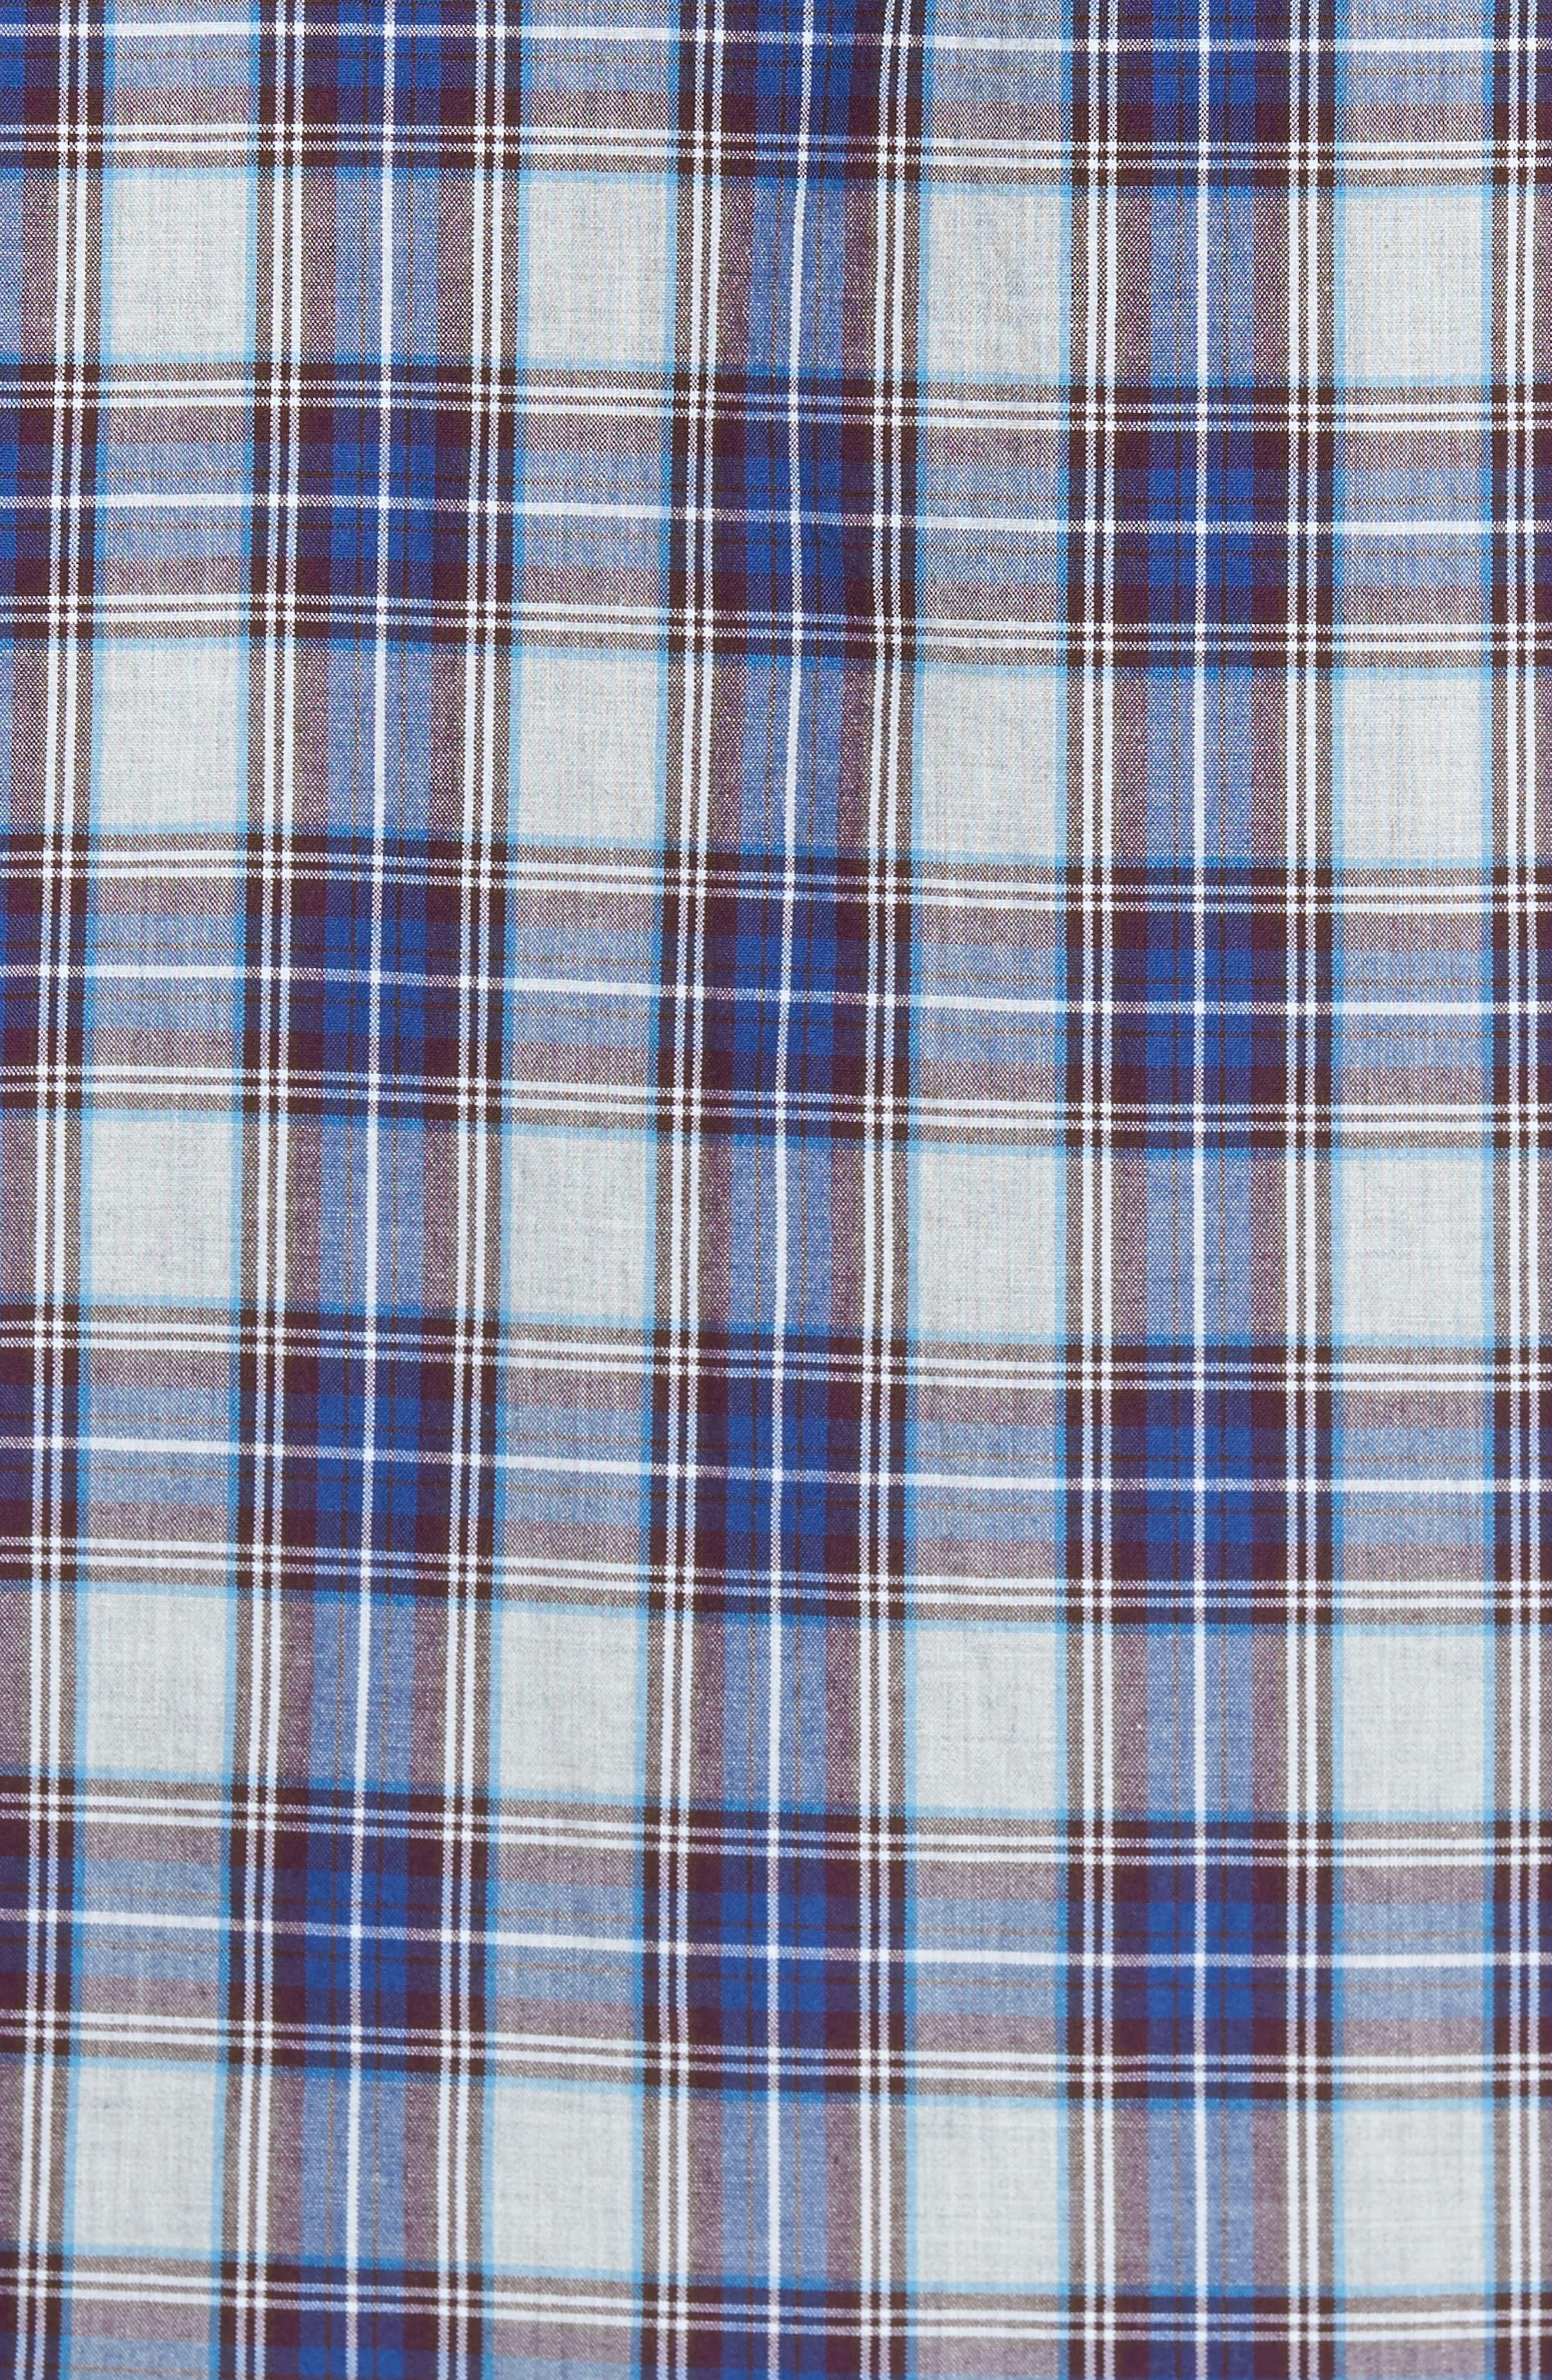 Slim Fit Washed Plaid Sport Shirt,                             Alternate thumbnail 5, color,                             Fallen Leaf Plaid